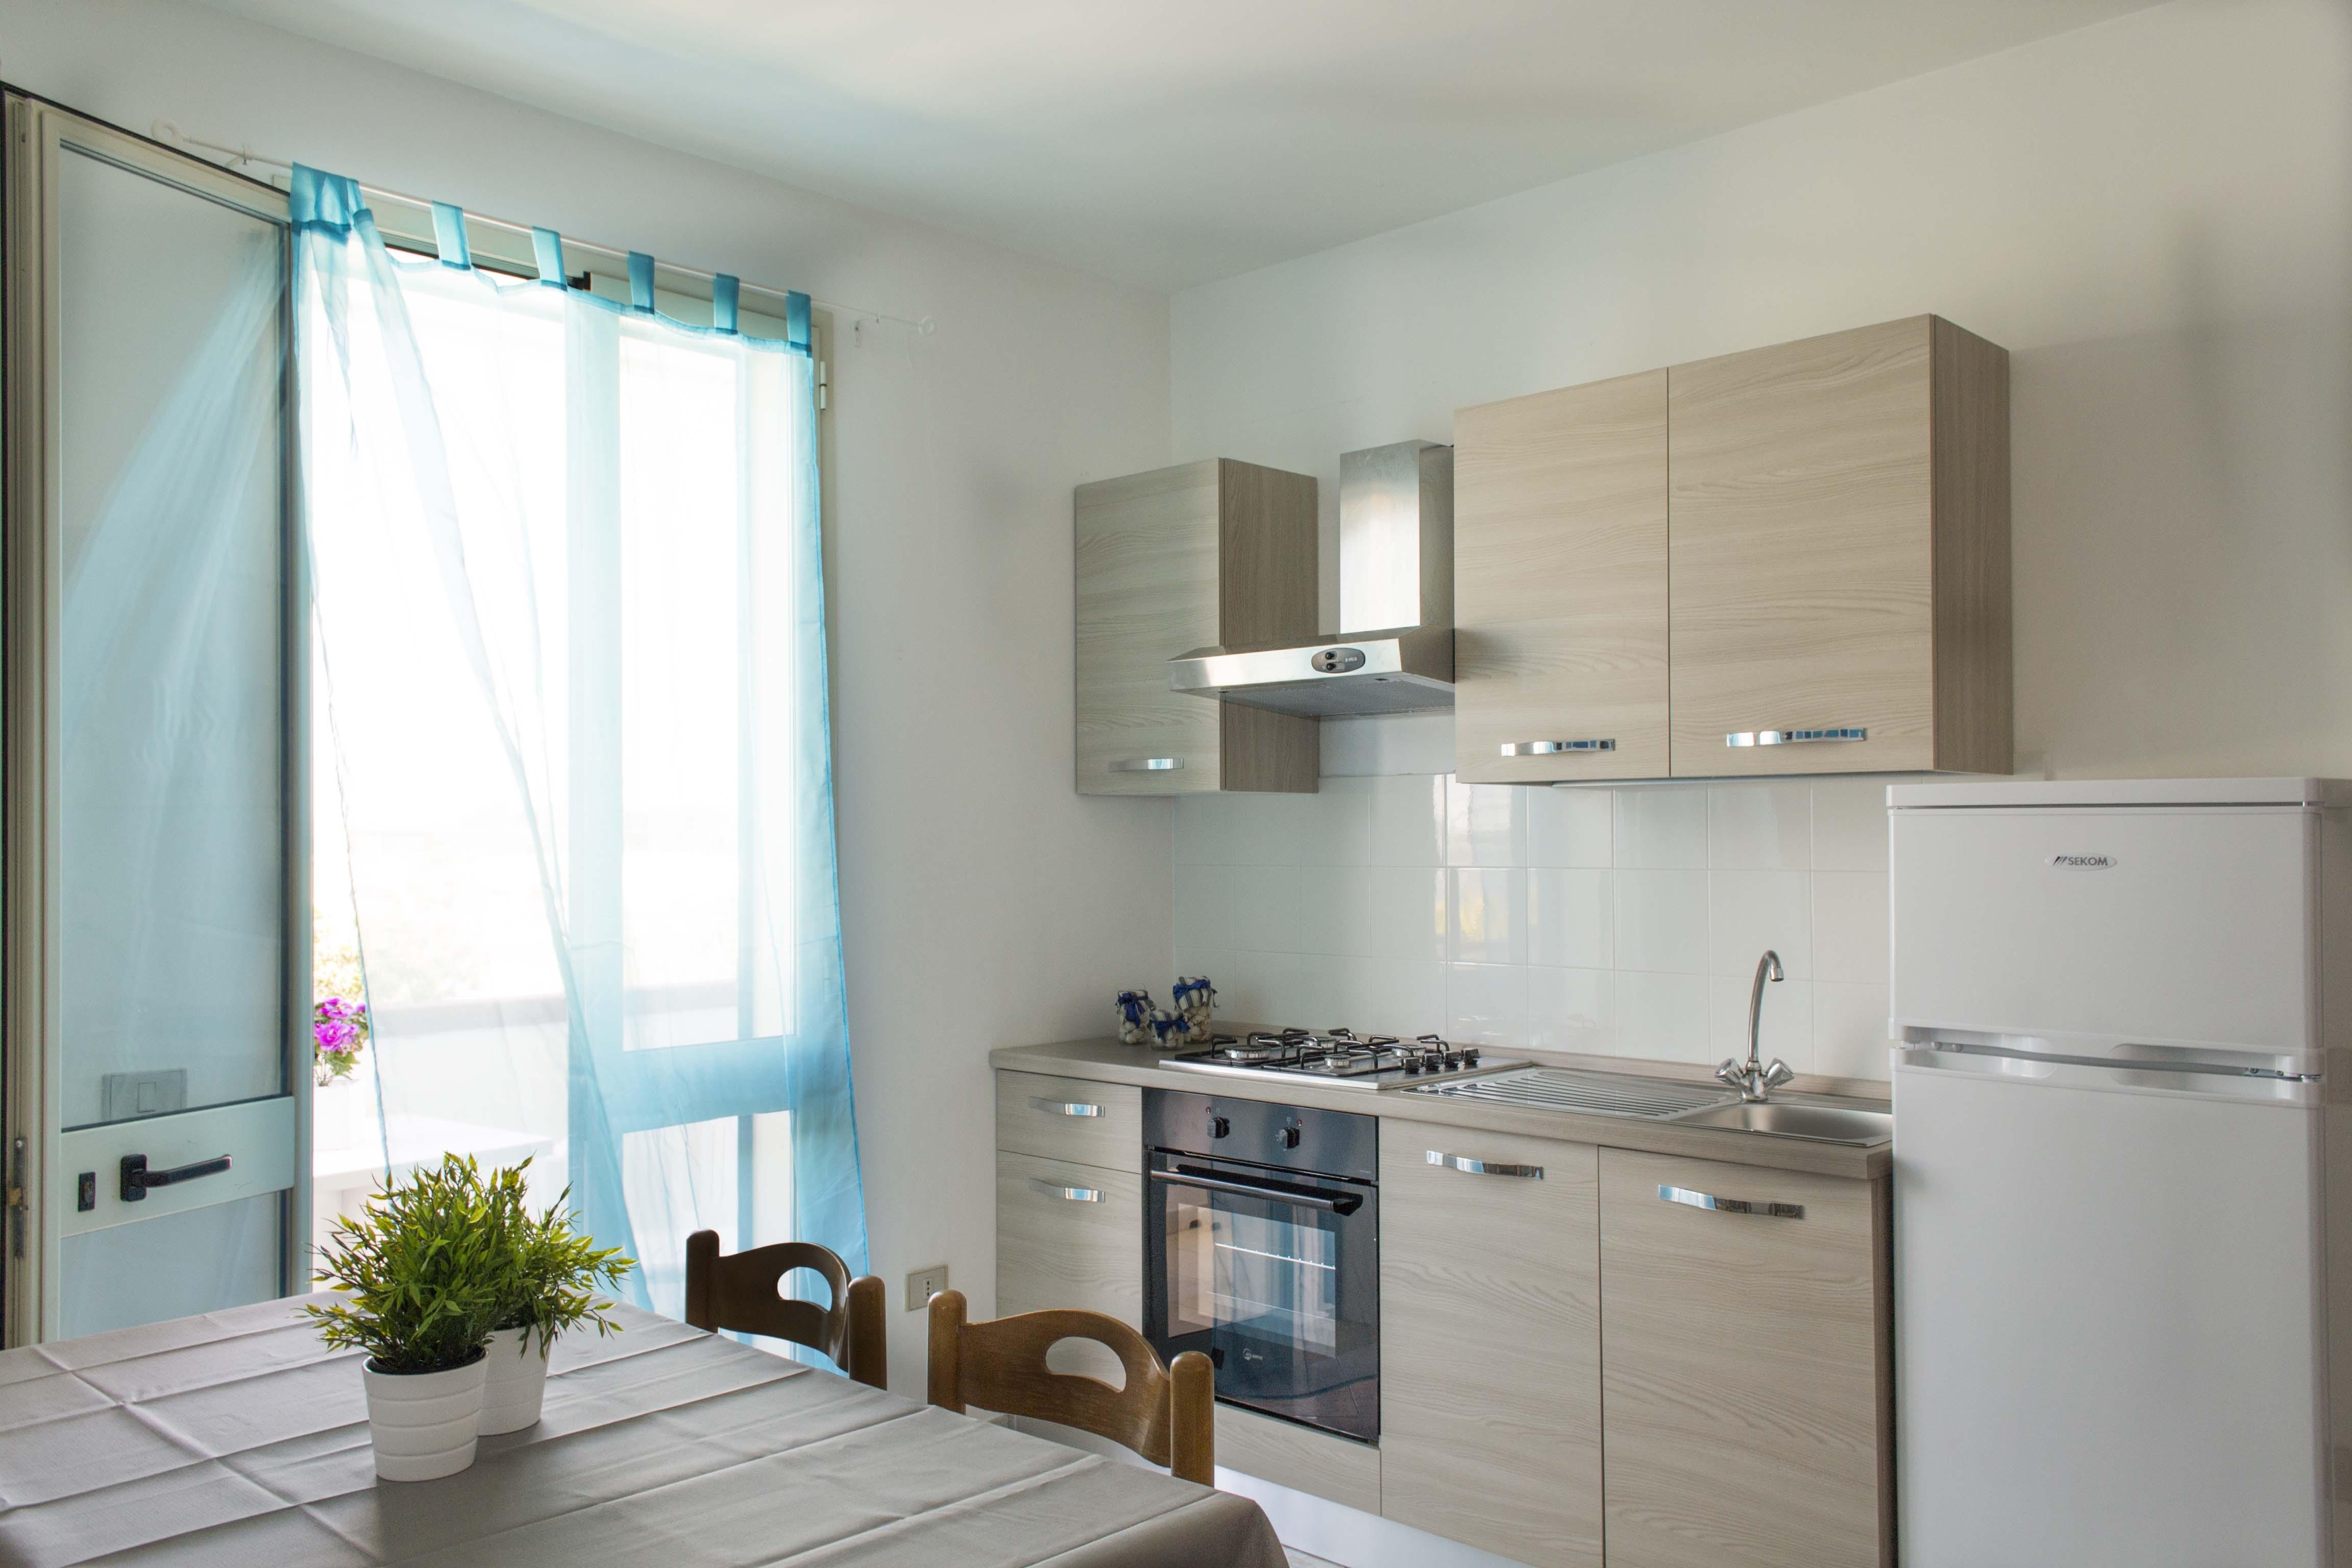 503_residence-petrarca_poesia_cusog2.jpg